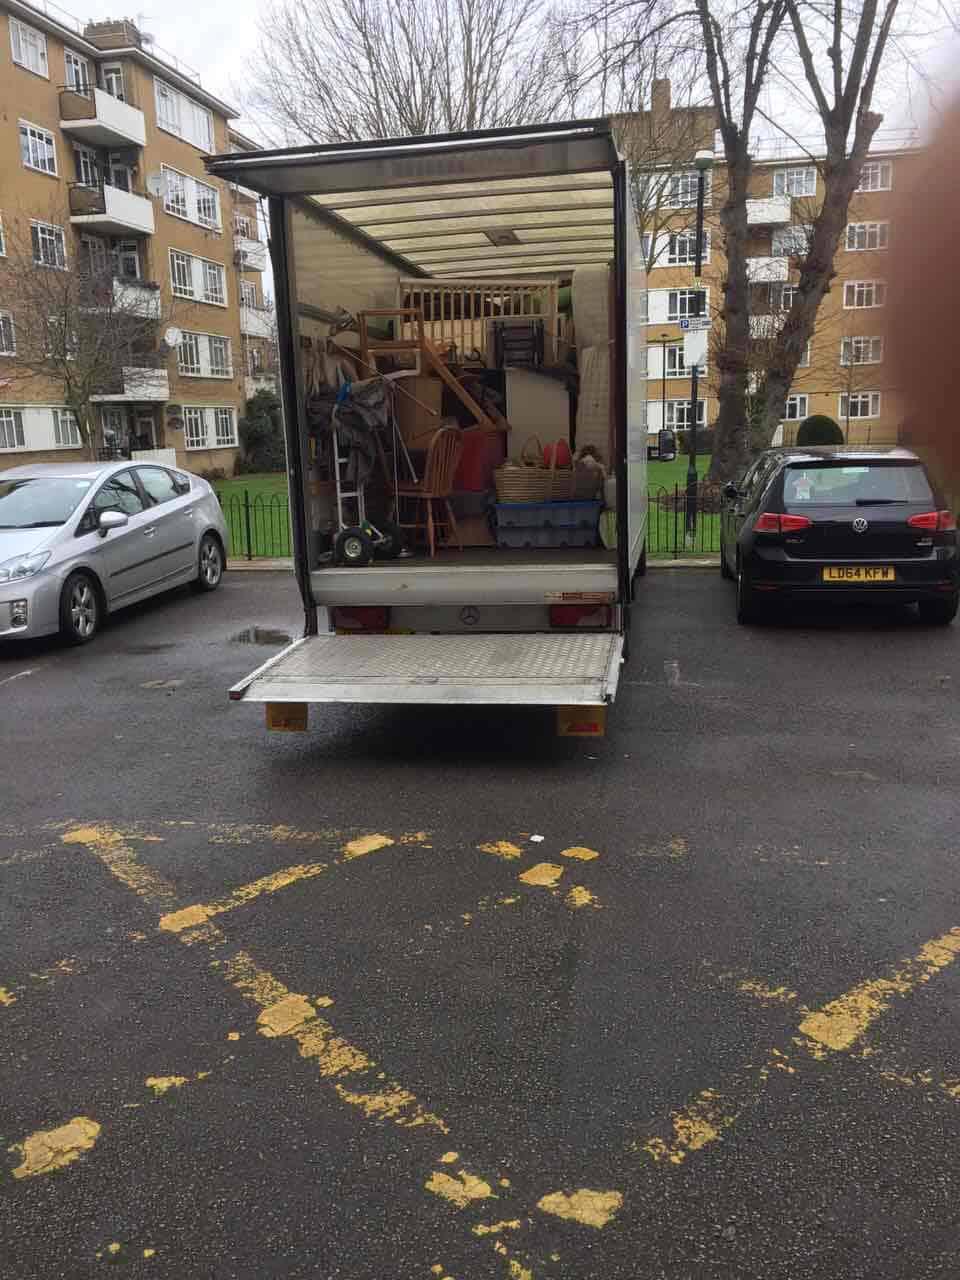 E4 moving truck